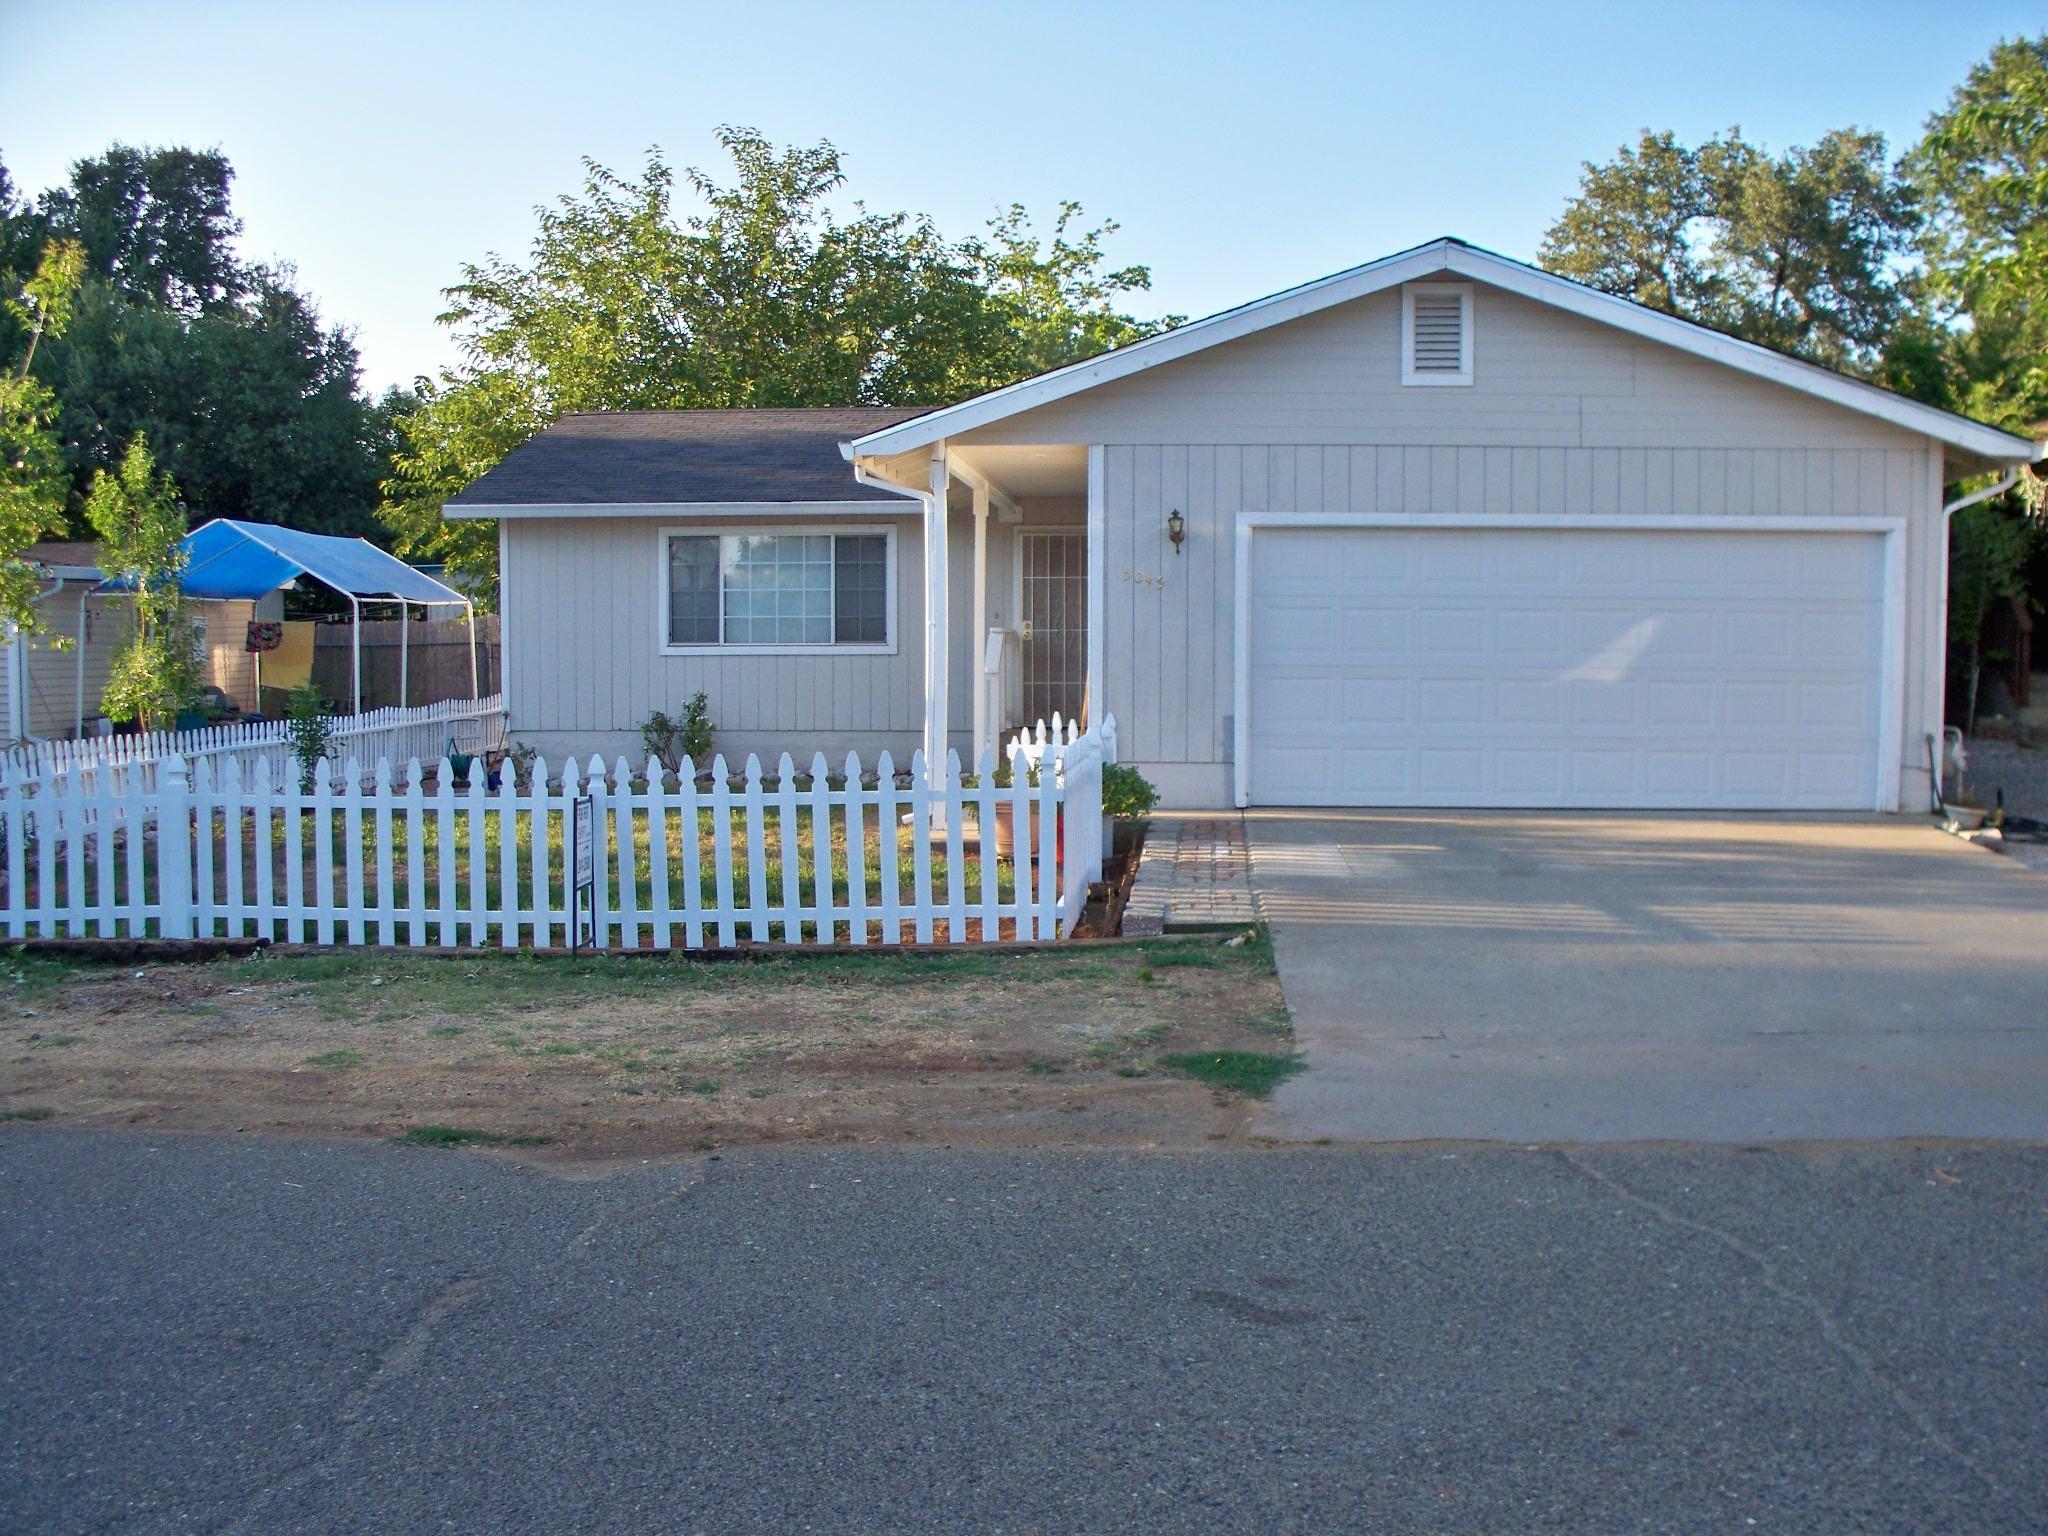 5049 Front St, Shasta Lake, CA 96019